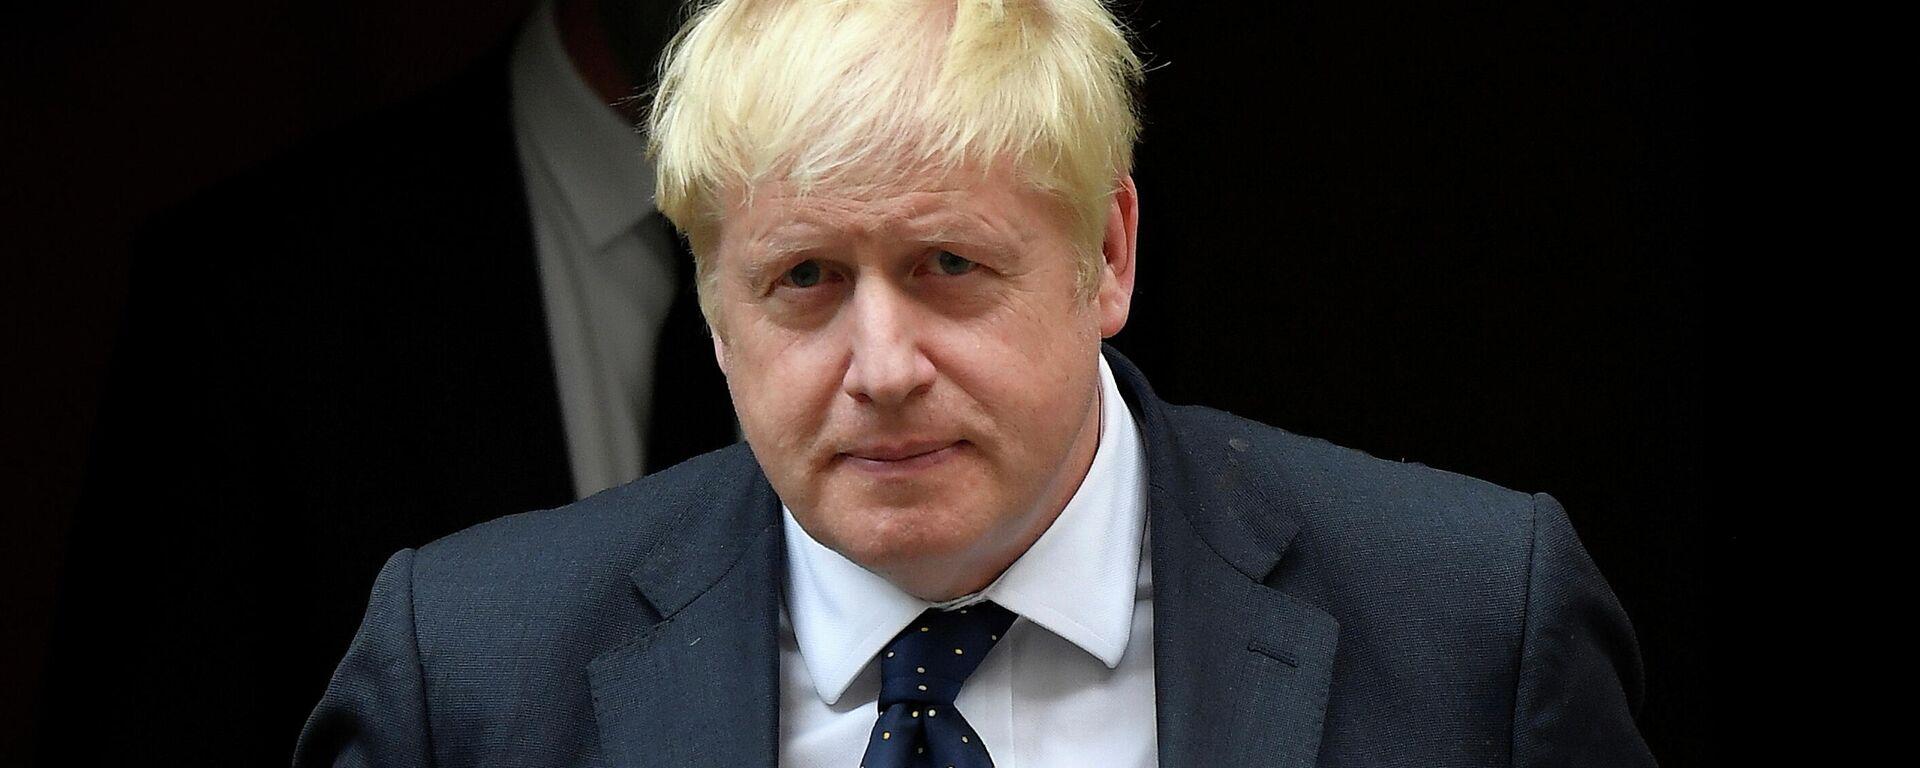 Boris Johnson, primer ministro del Reino Unido - Sputnik Mundo, 1920, 16.09.2021